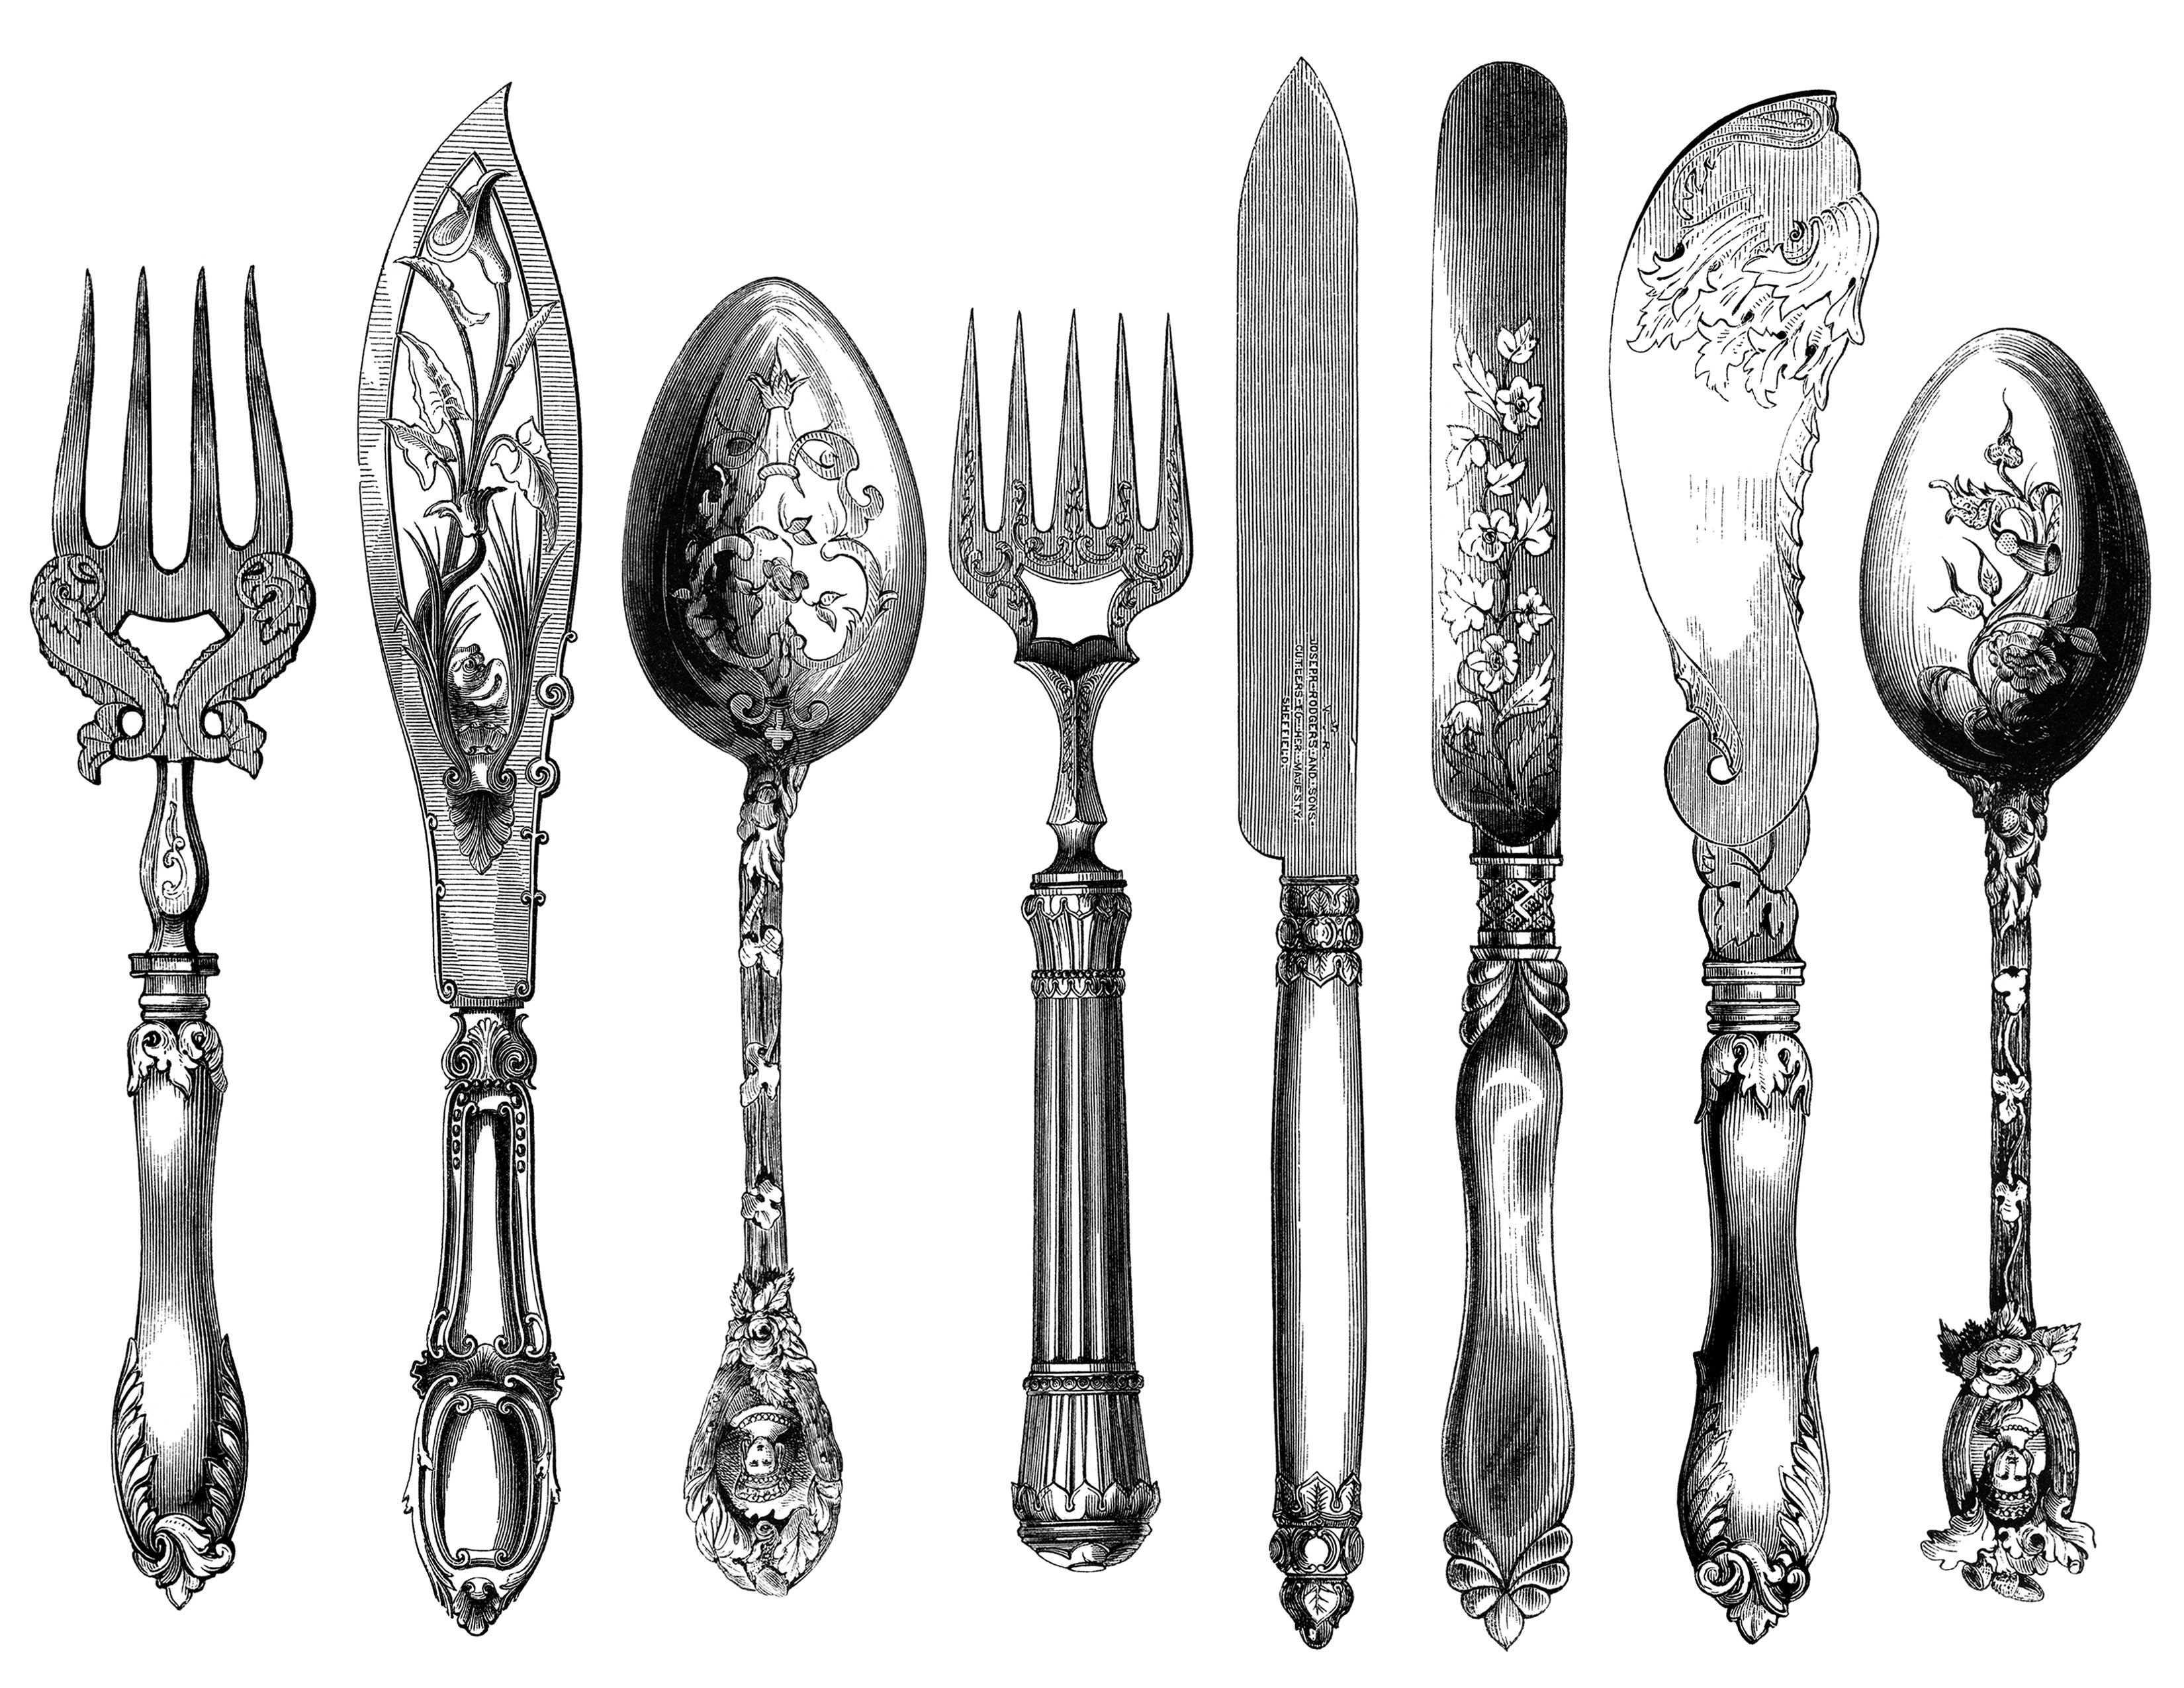 image black and white download Utensils clipart vintage. Cutlery engraving fork knife